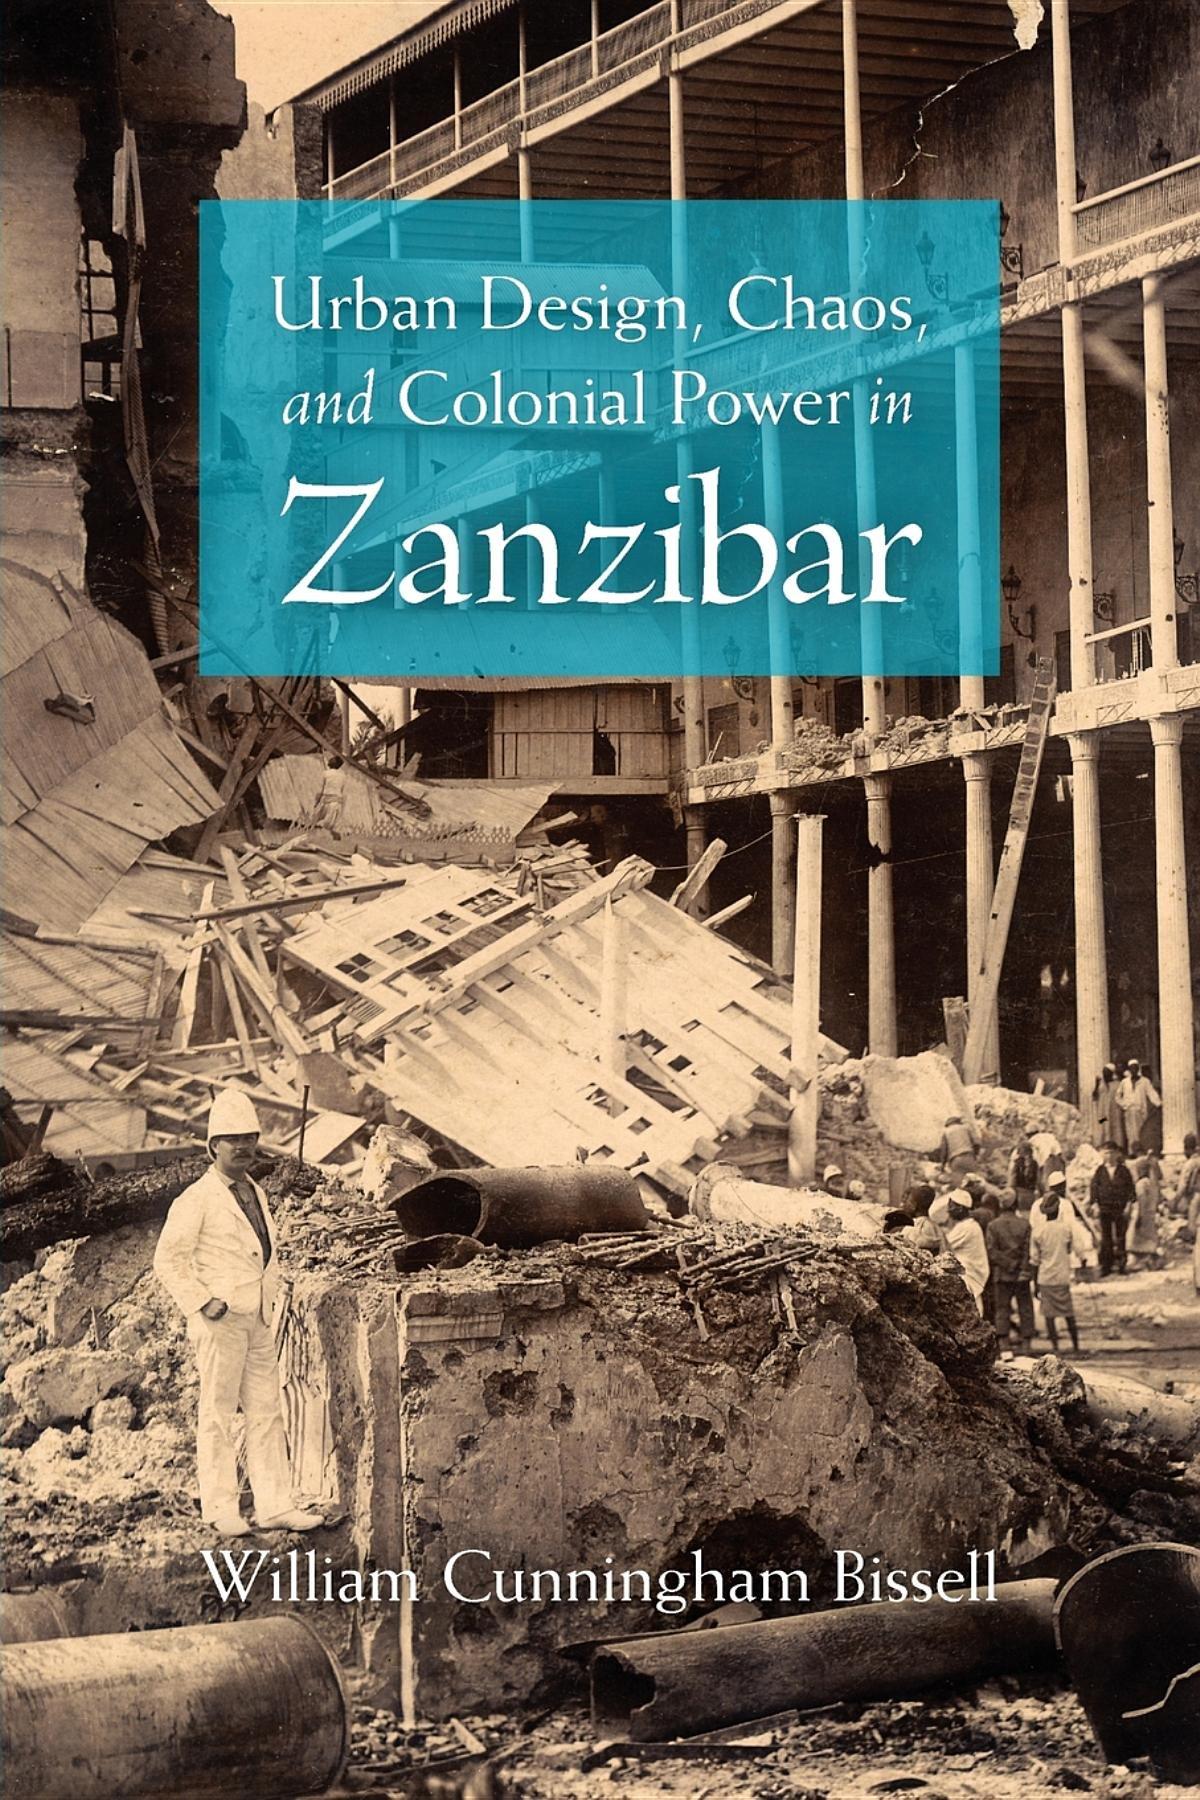 Download Urban Design, Chaos, and Colonial Power in Zanzibar PDF